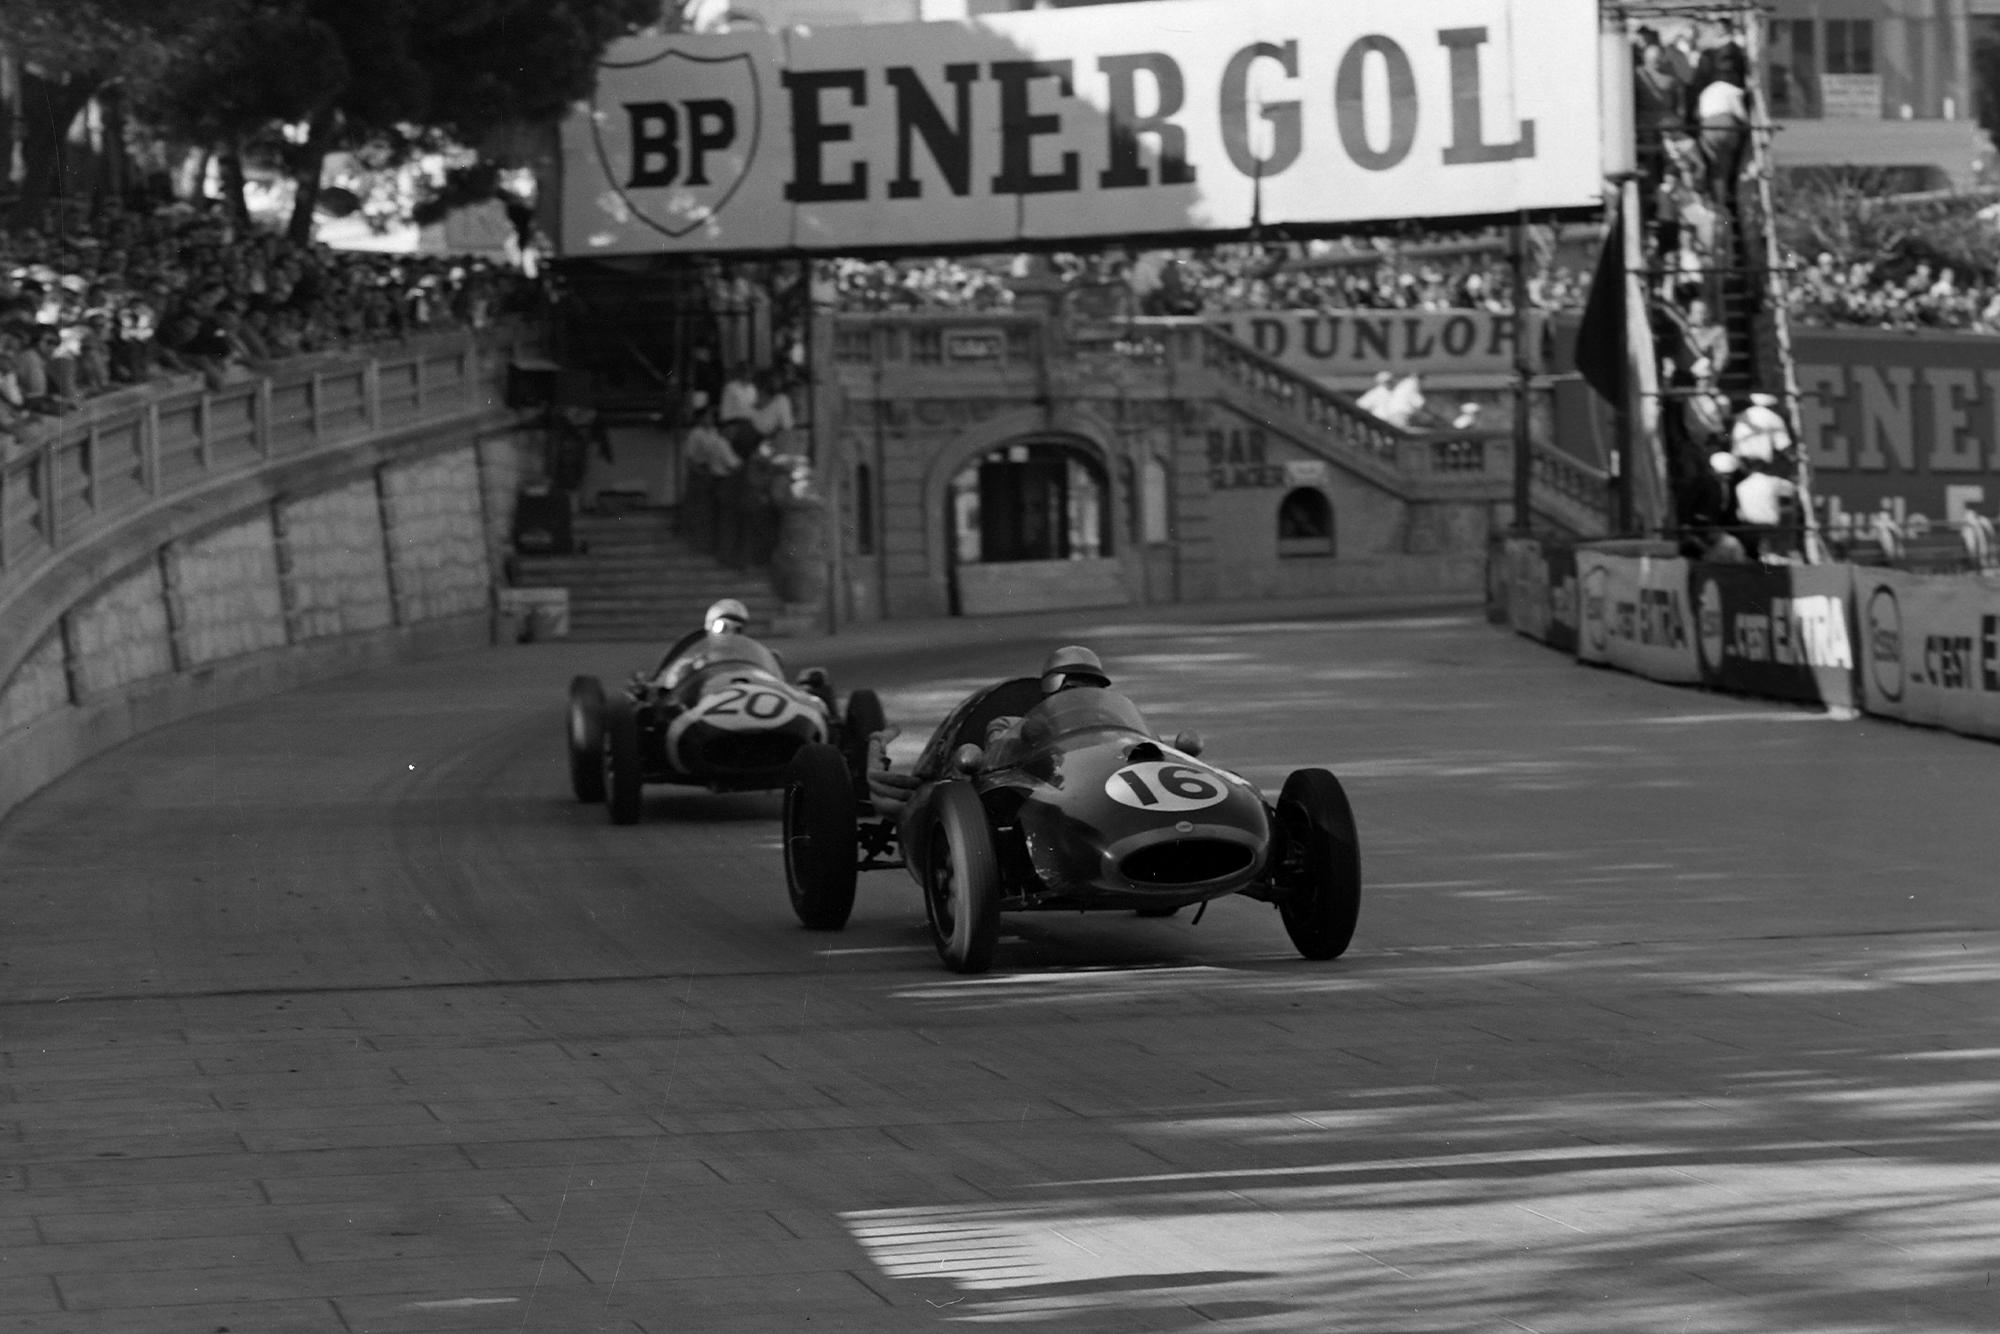 Jack Brabham in his Cooper during the 1958 Monaco Grand Prix